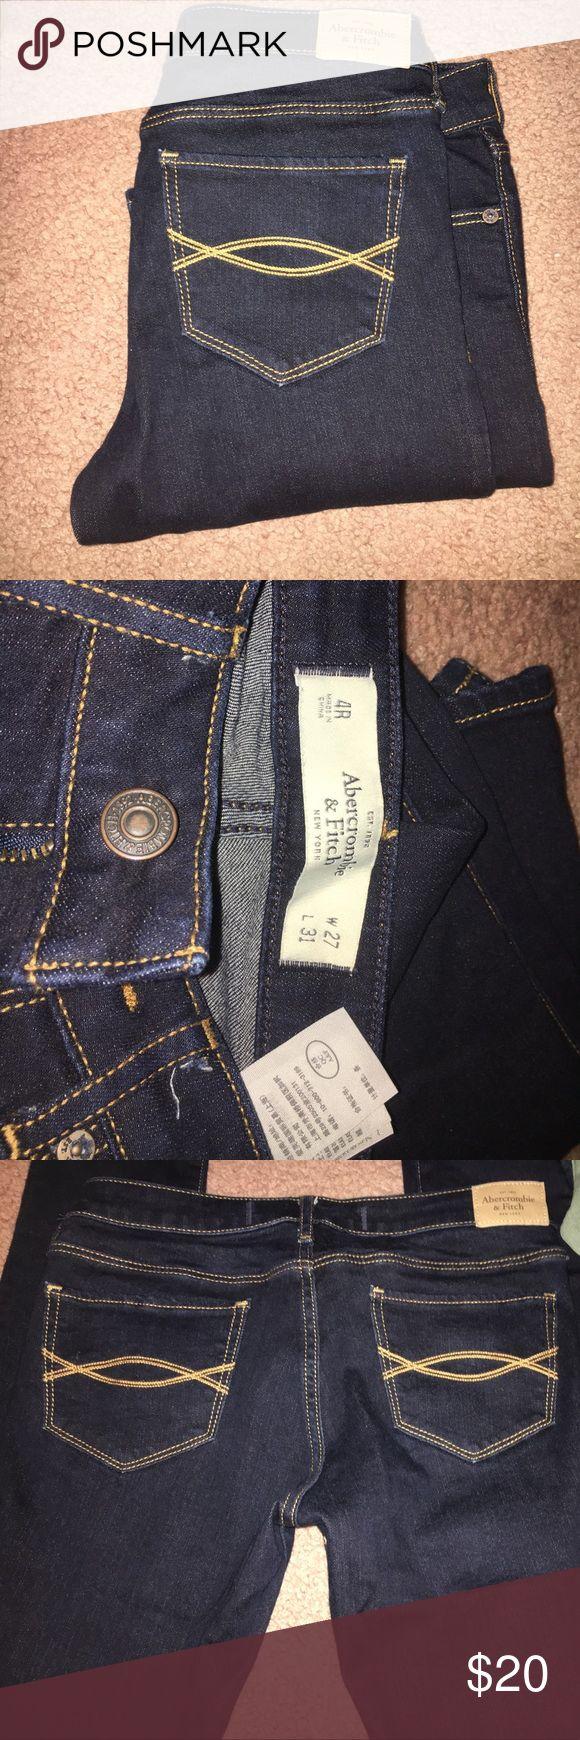 Abercrombie jeans Brand-new never worn Abercrombie jeans! Dark wash! Size 4R Abercrombie & Fitch Jeans Skinny